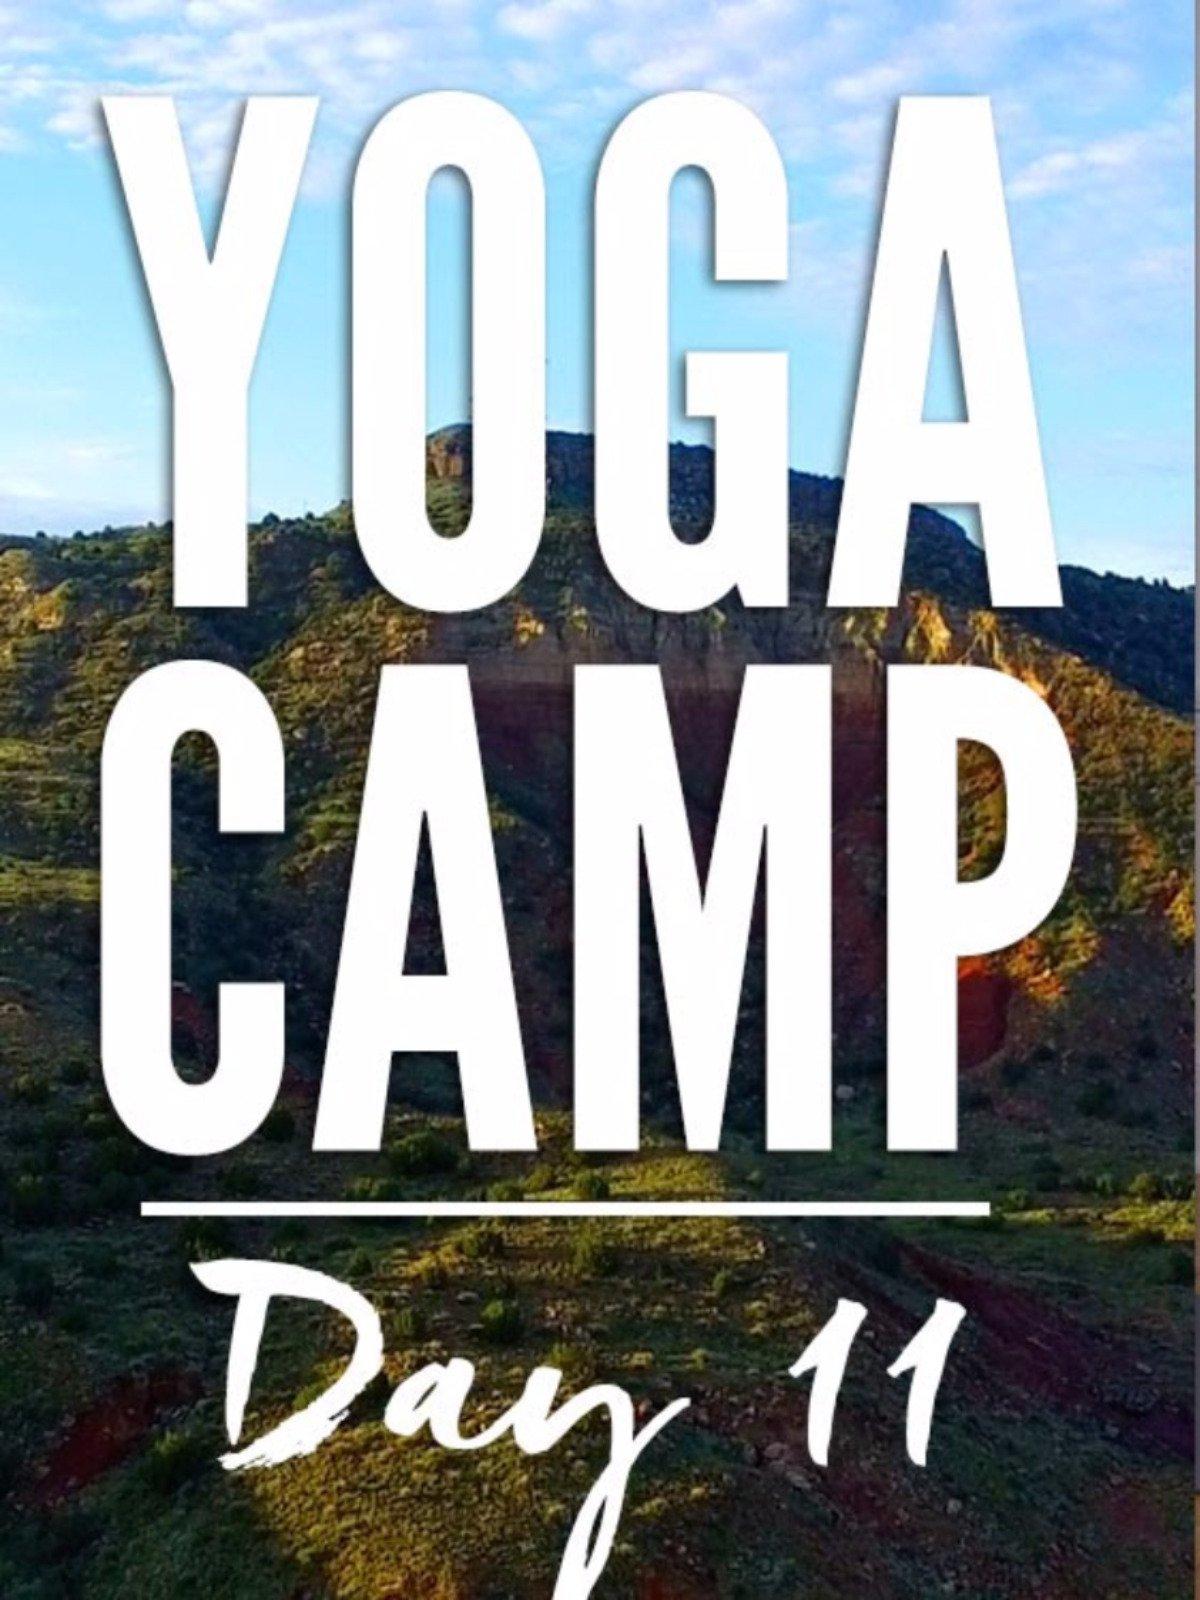 Yoga Camp Day 11